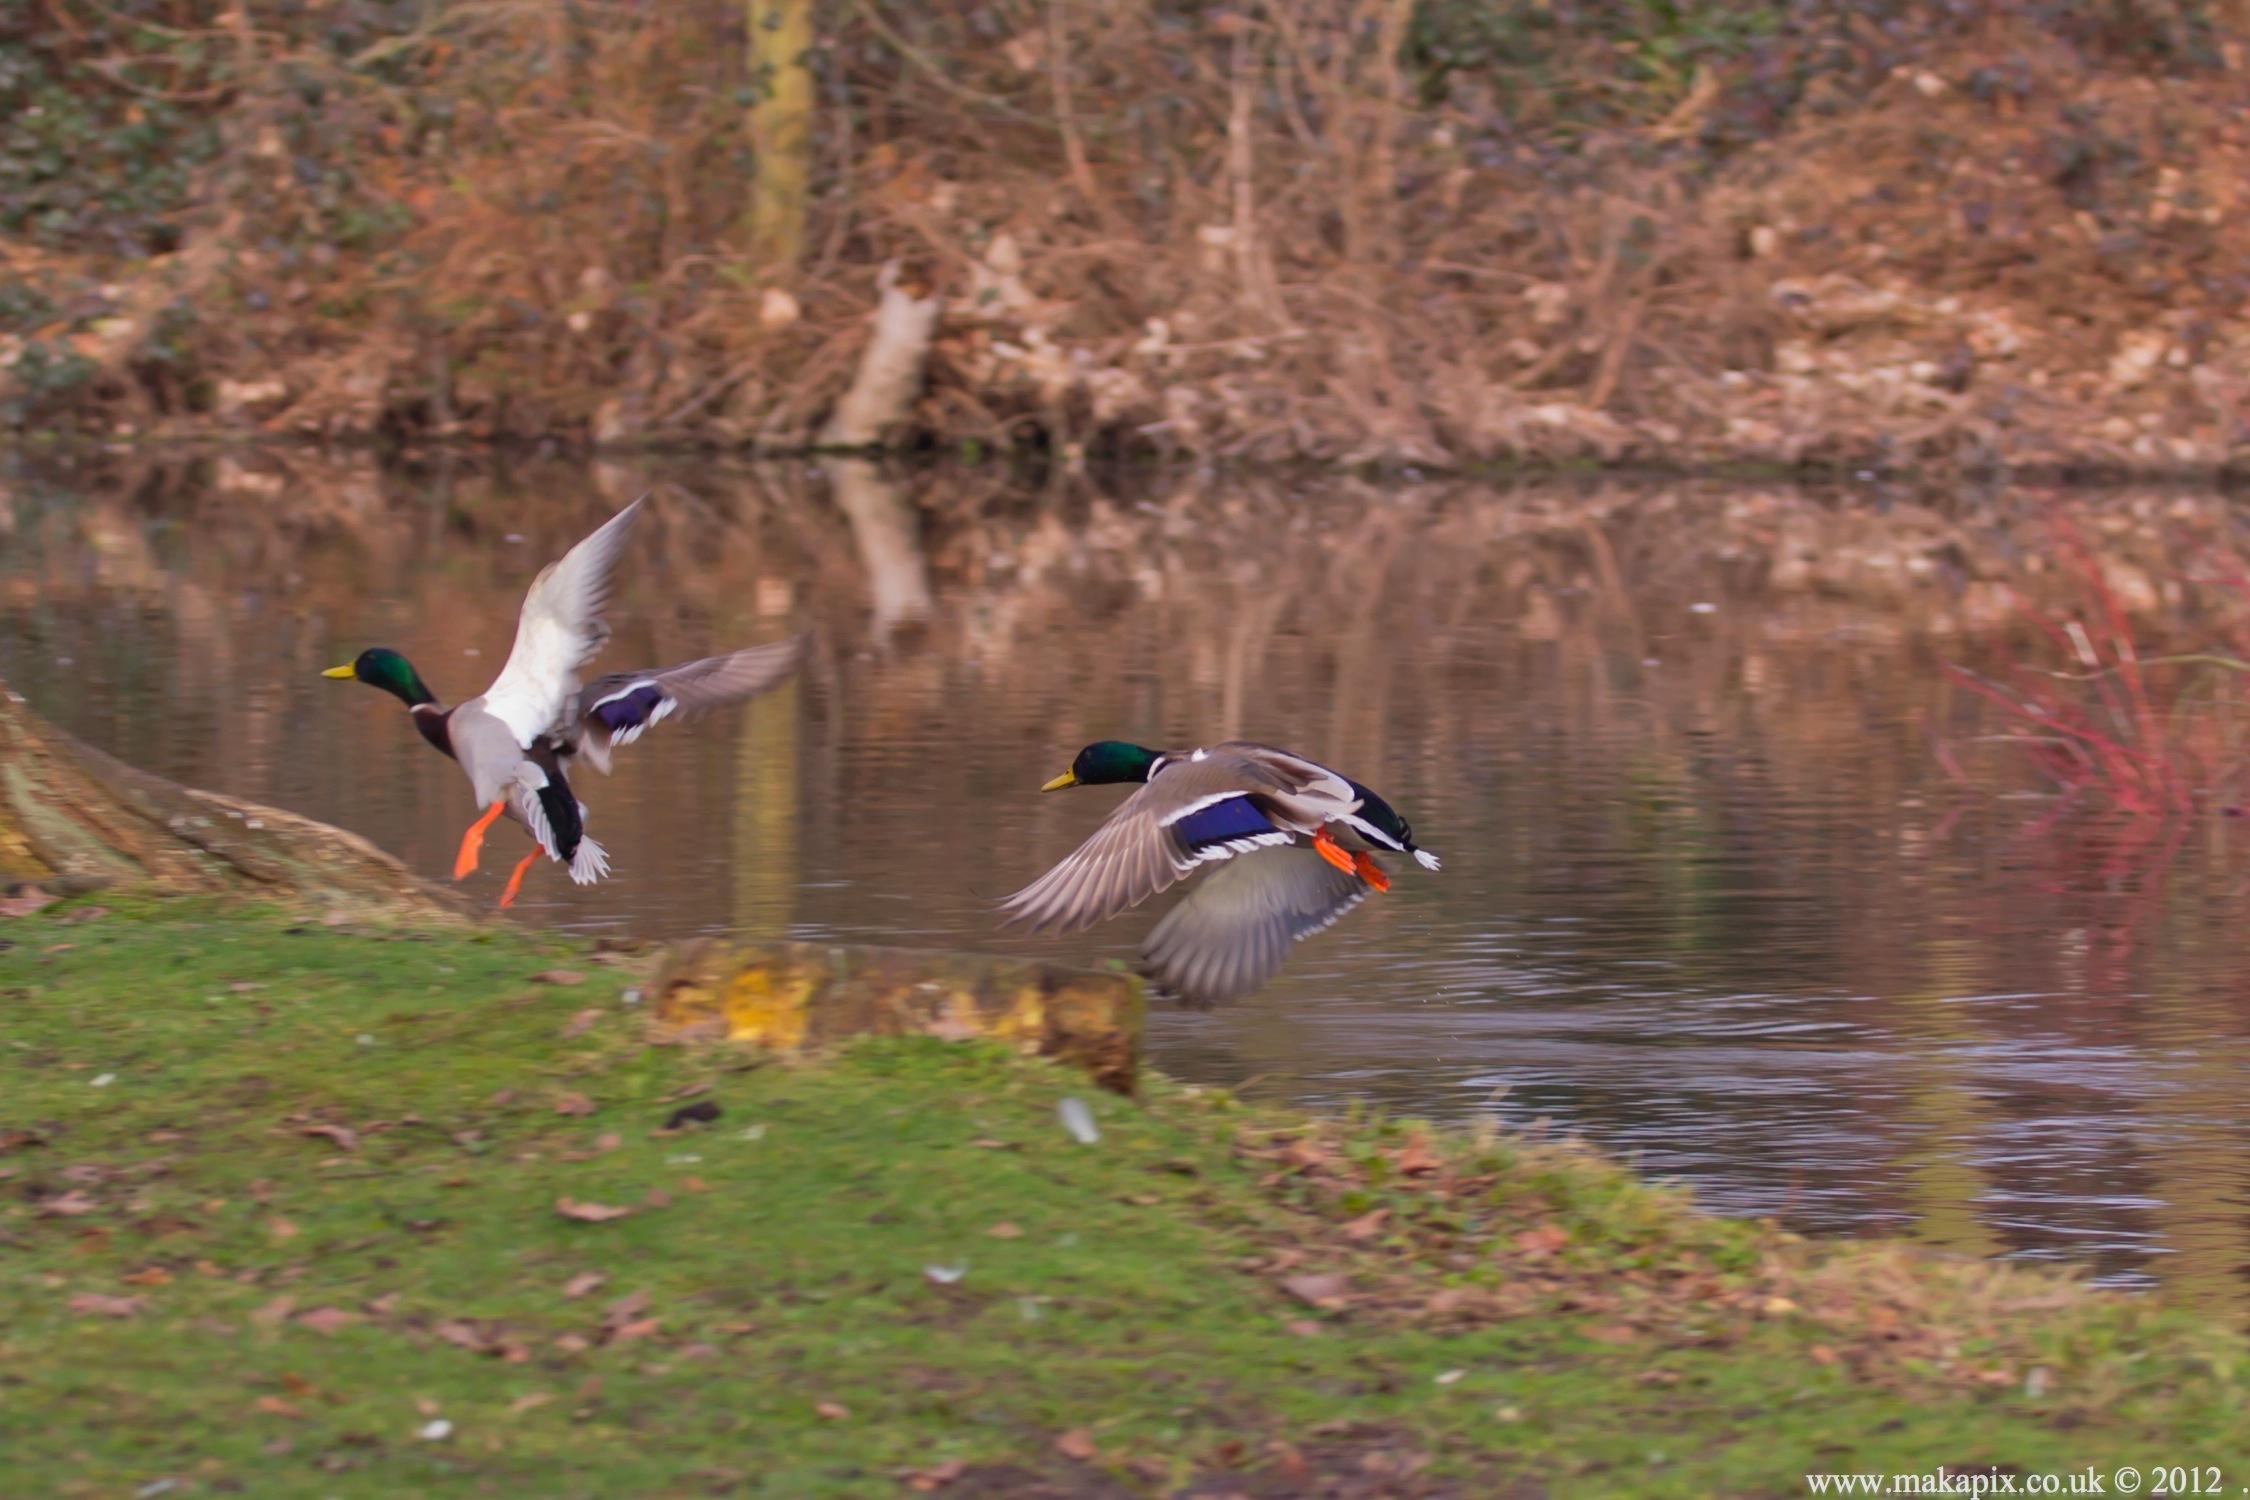 Bushy Park, Teddington